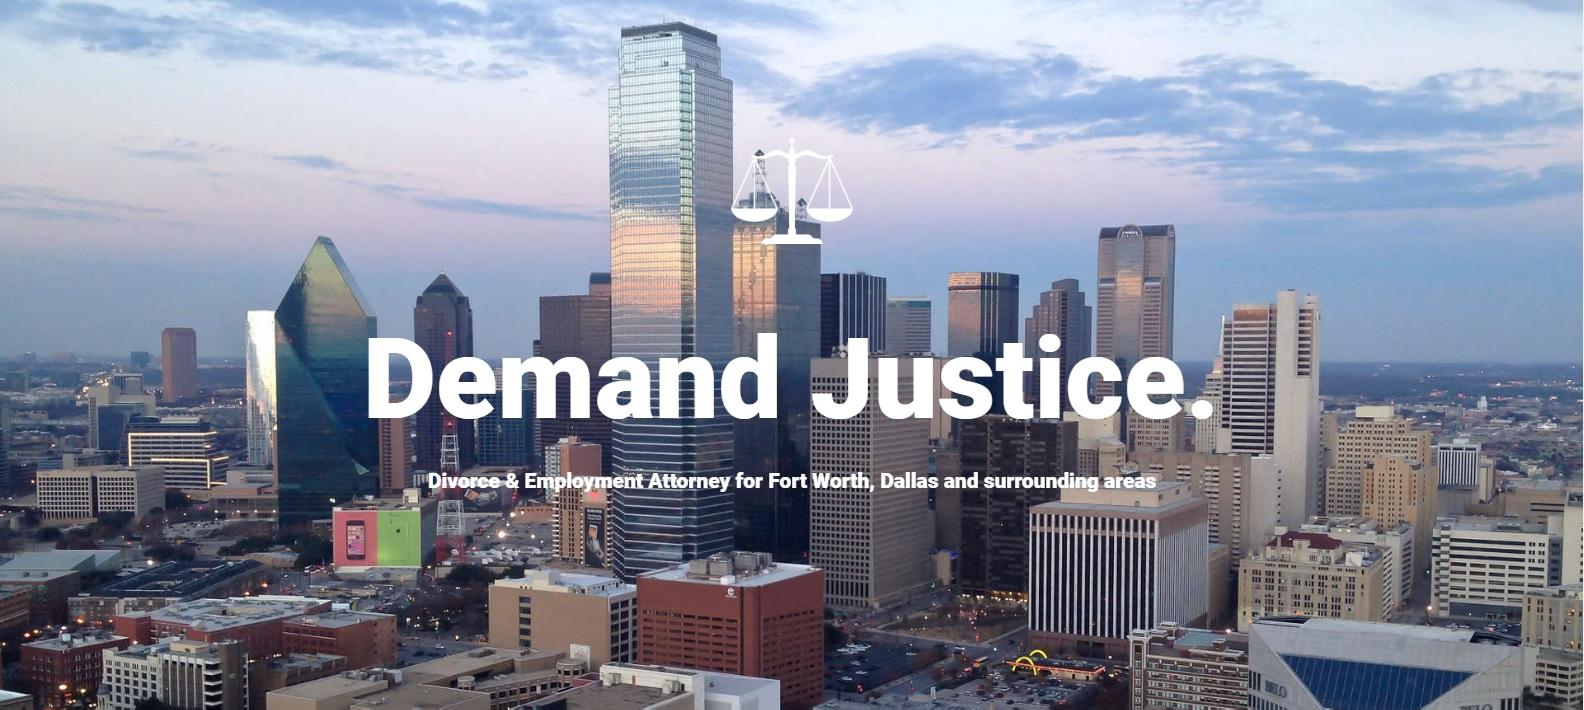 Employment attorney, Divorce attorney in Fort Worth, Dallas and Bedford